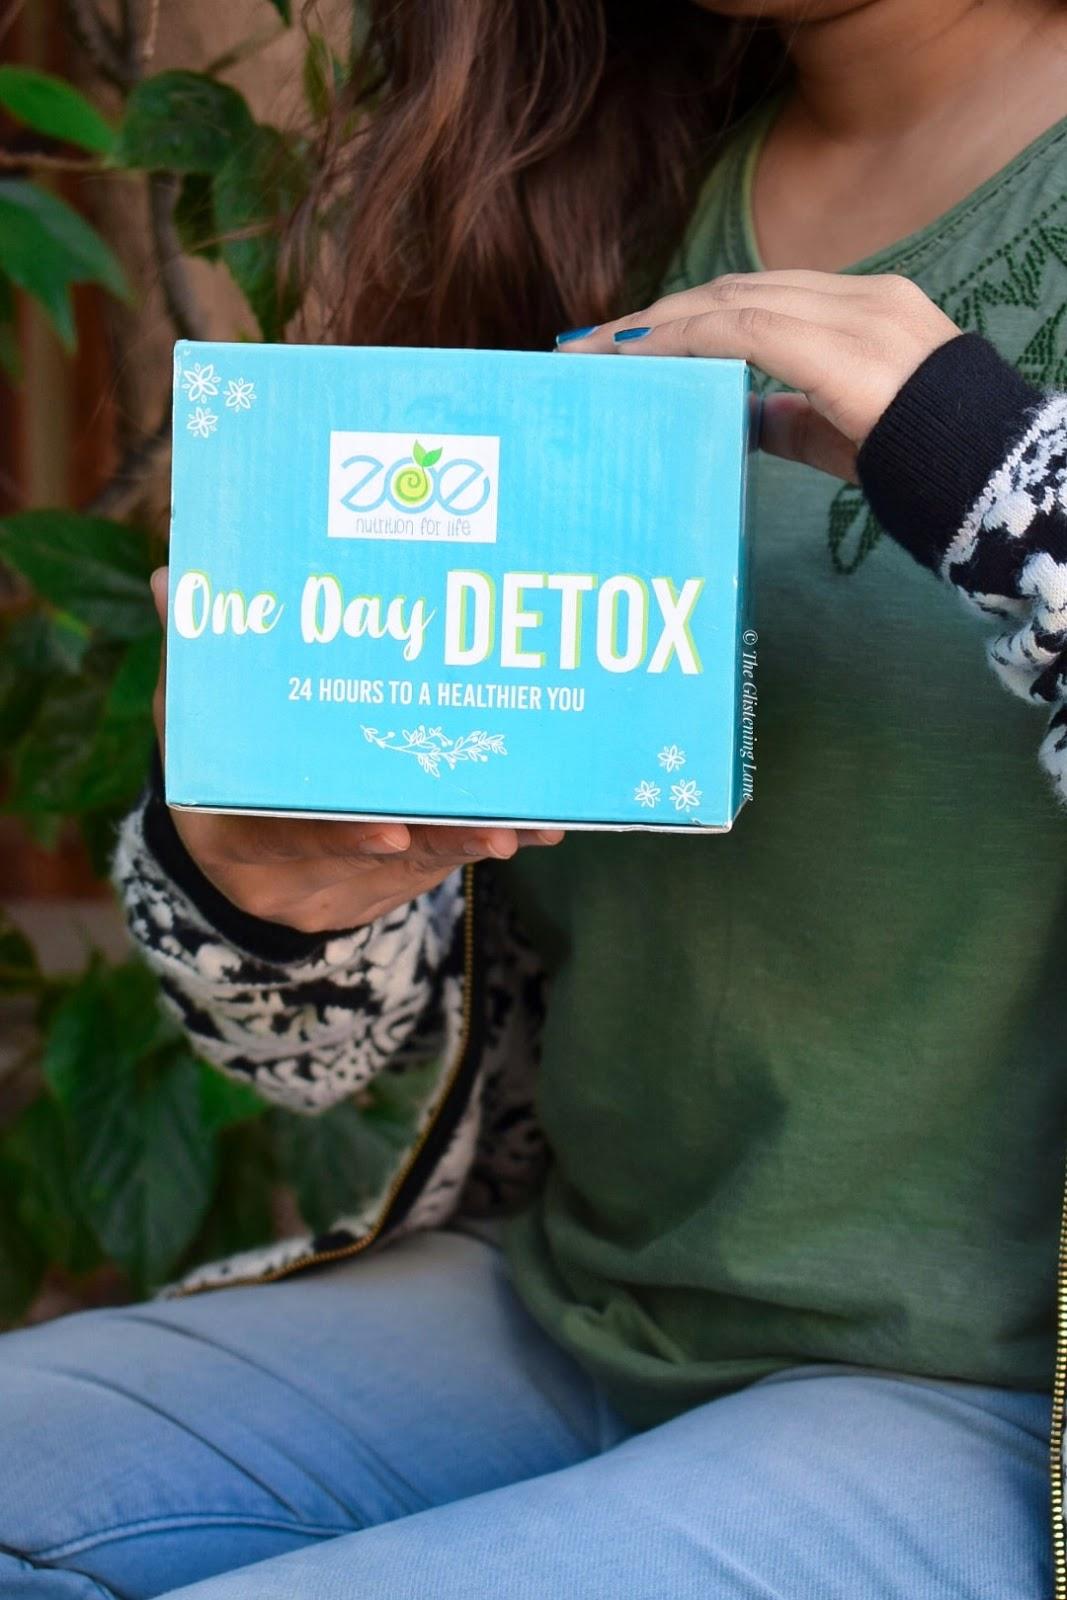 zoe-nutrition-detox